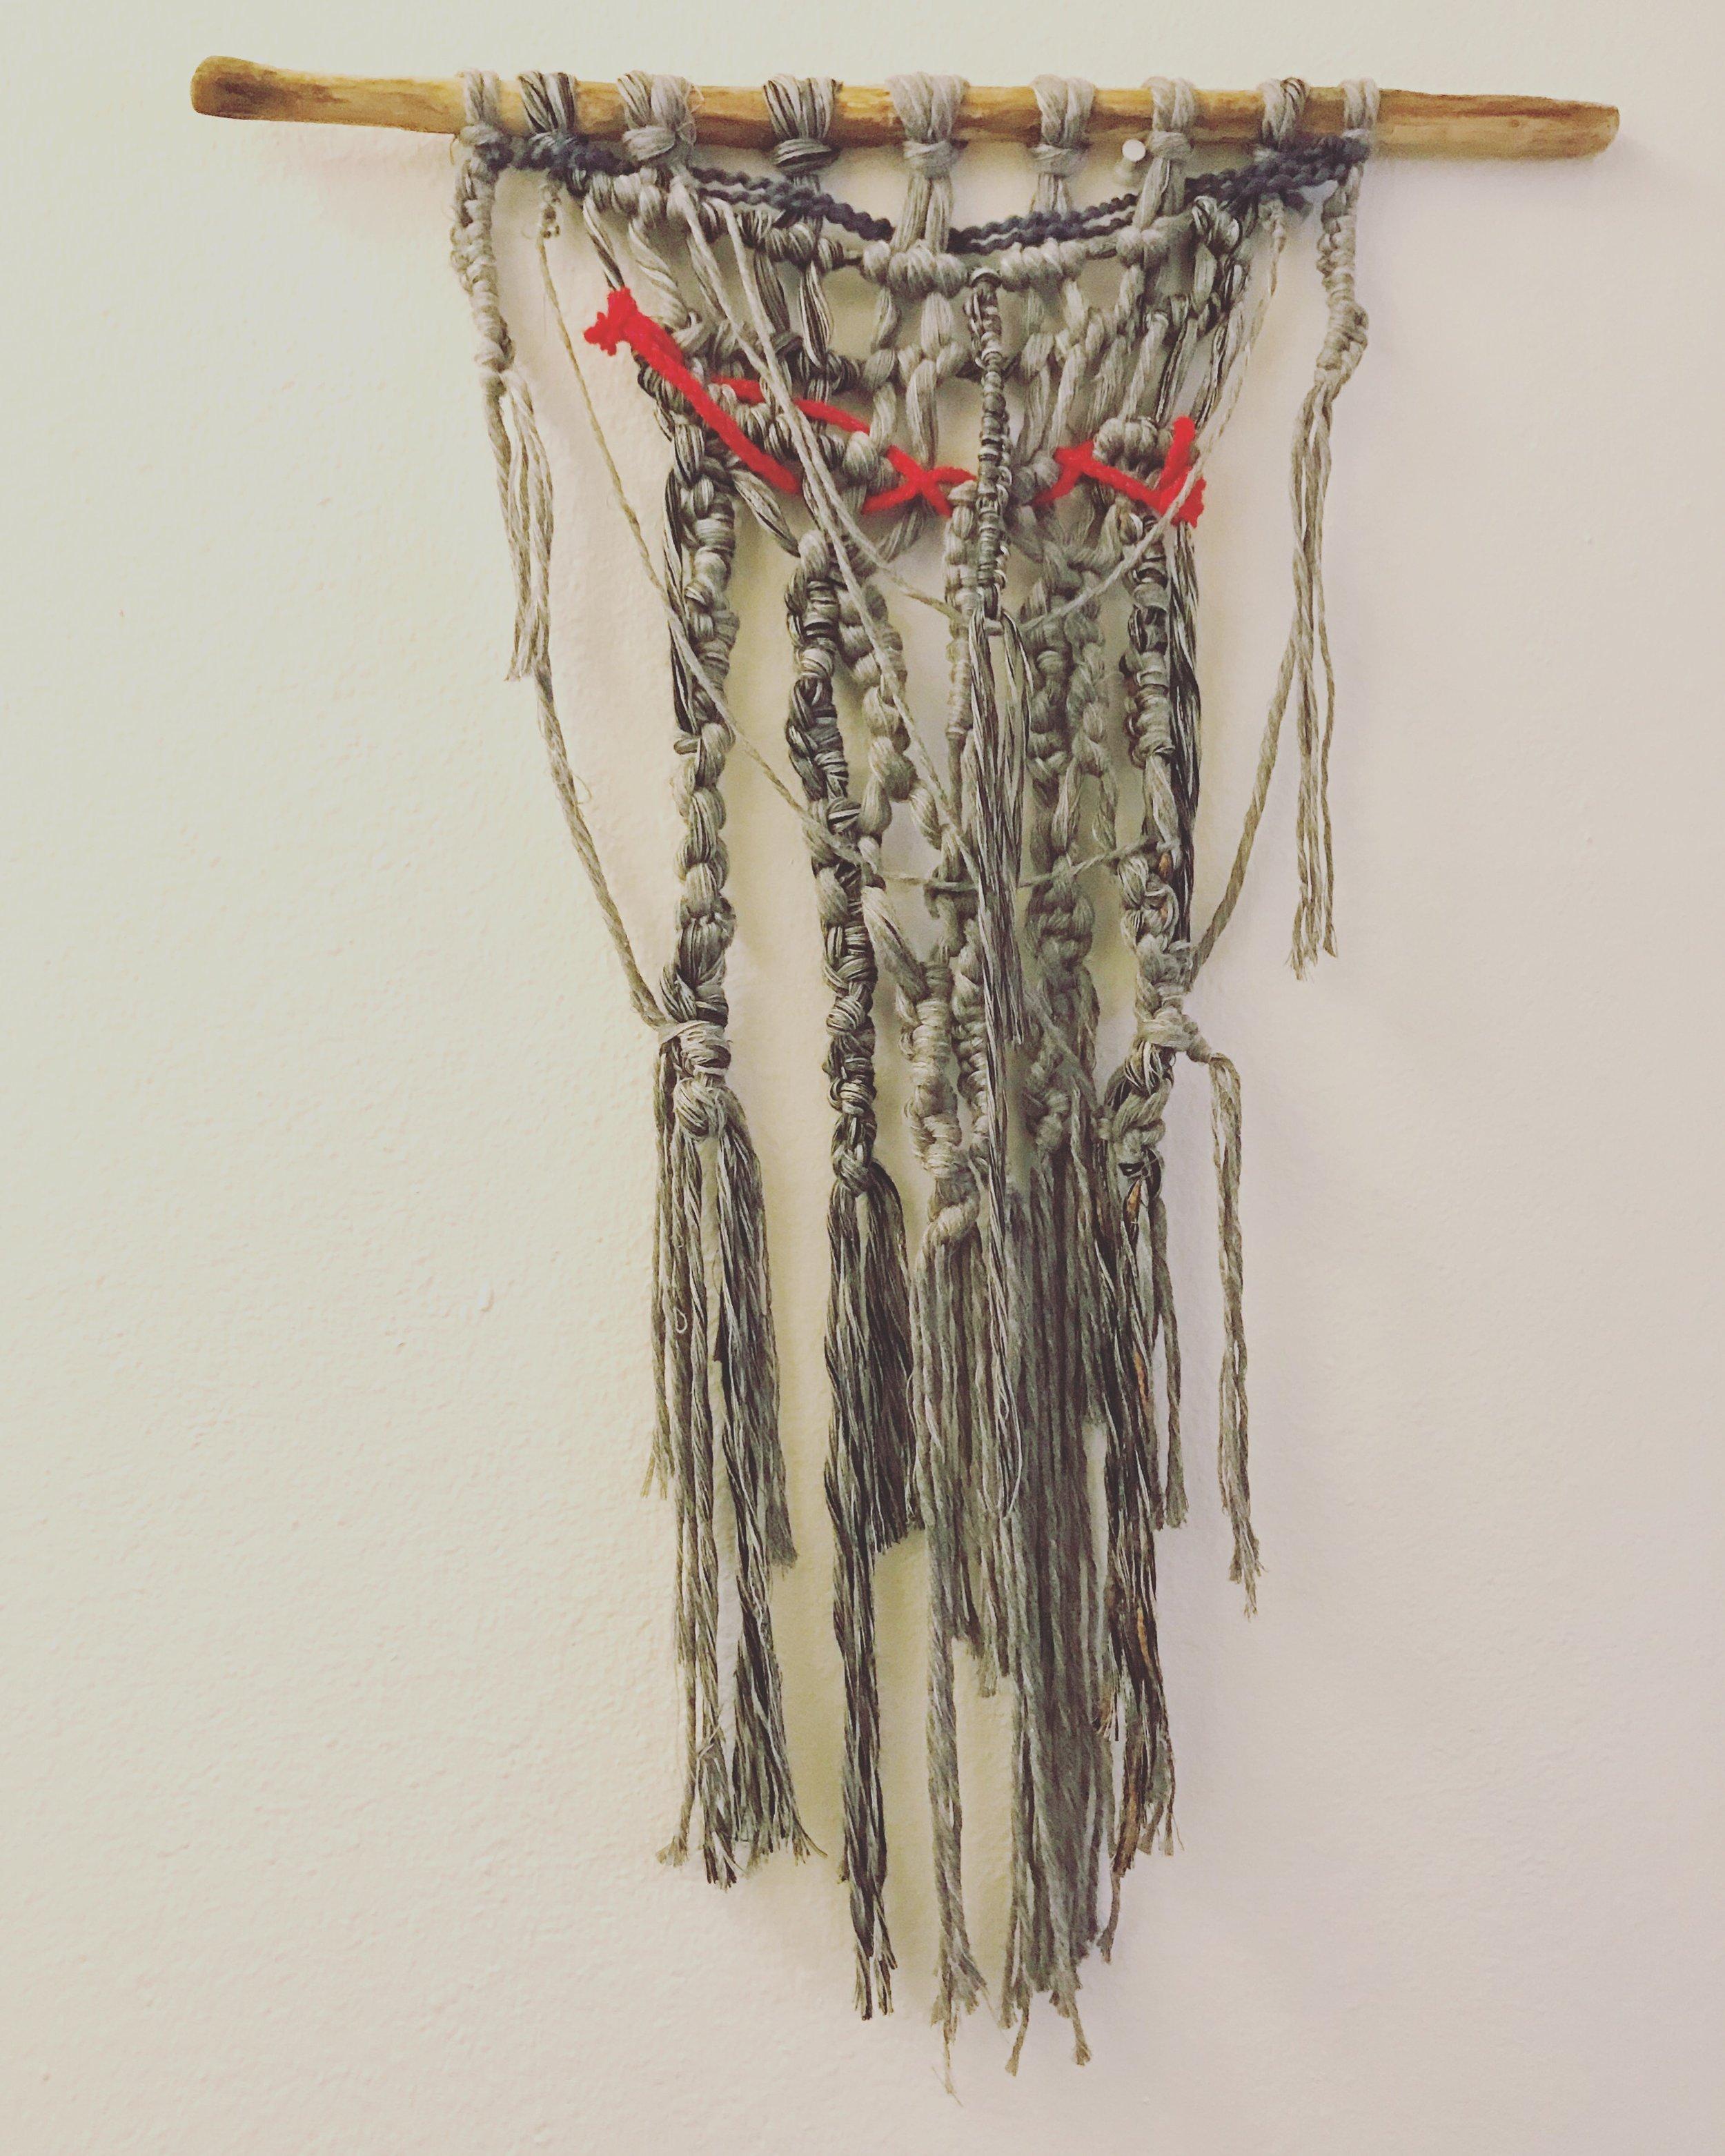 macrame2 - Samantha Koehn.jpeg